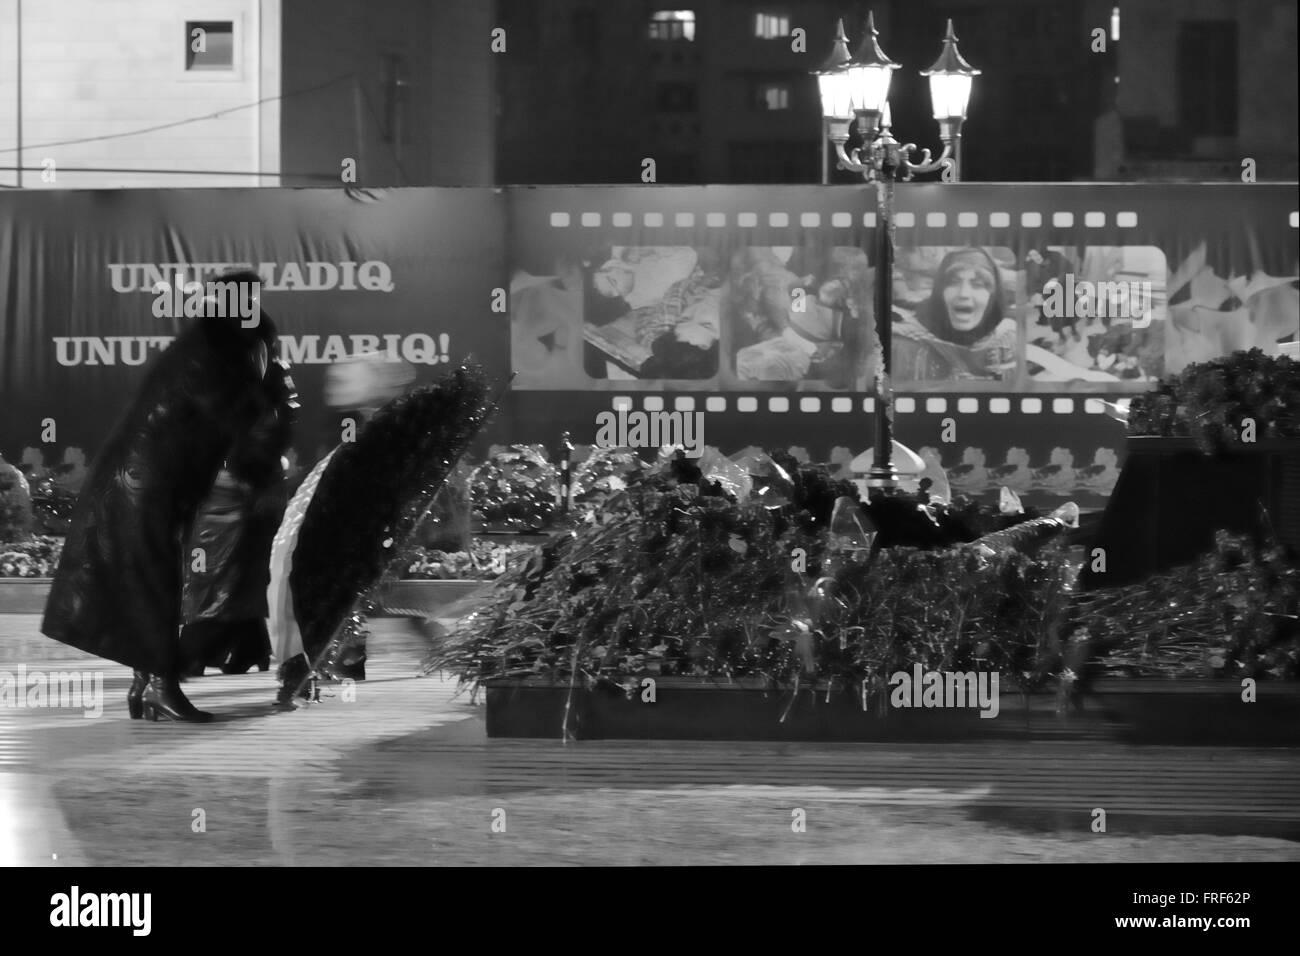 BAKU, AZERBAIJAN - 26 FEB 2014 Khojaly mourners on the anniversary of the massacre, in Baku, capital of Azerbaijan - Stock Image